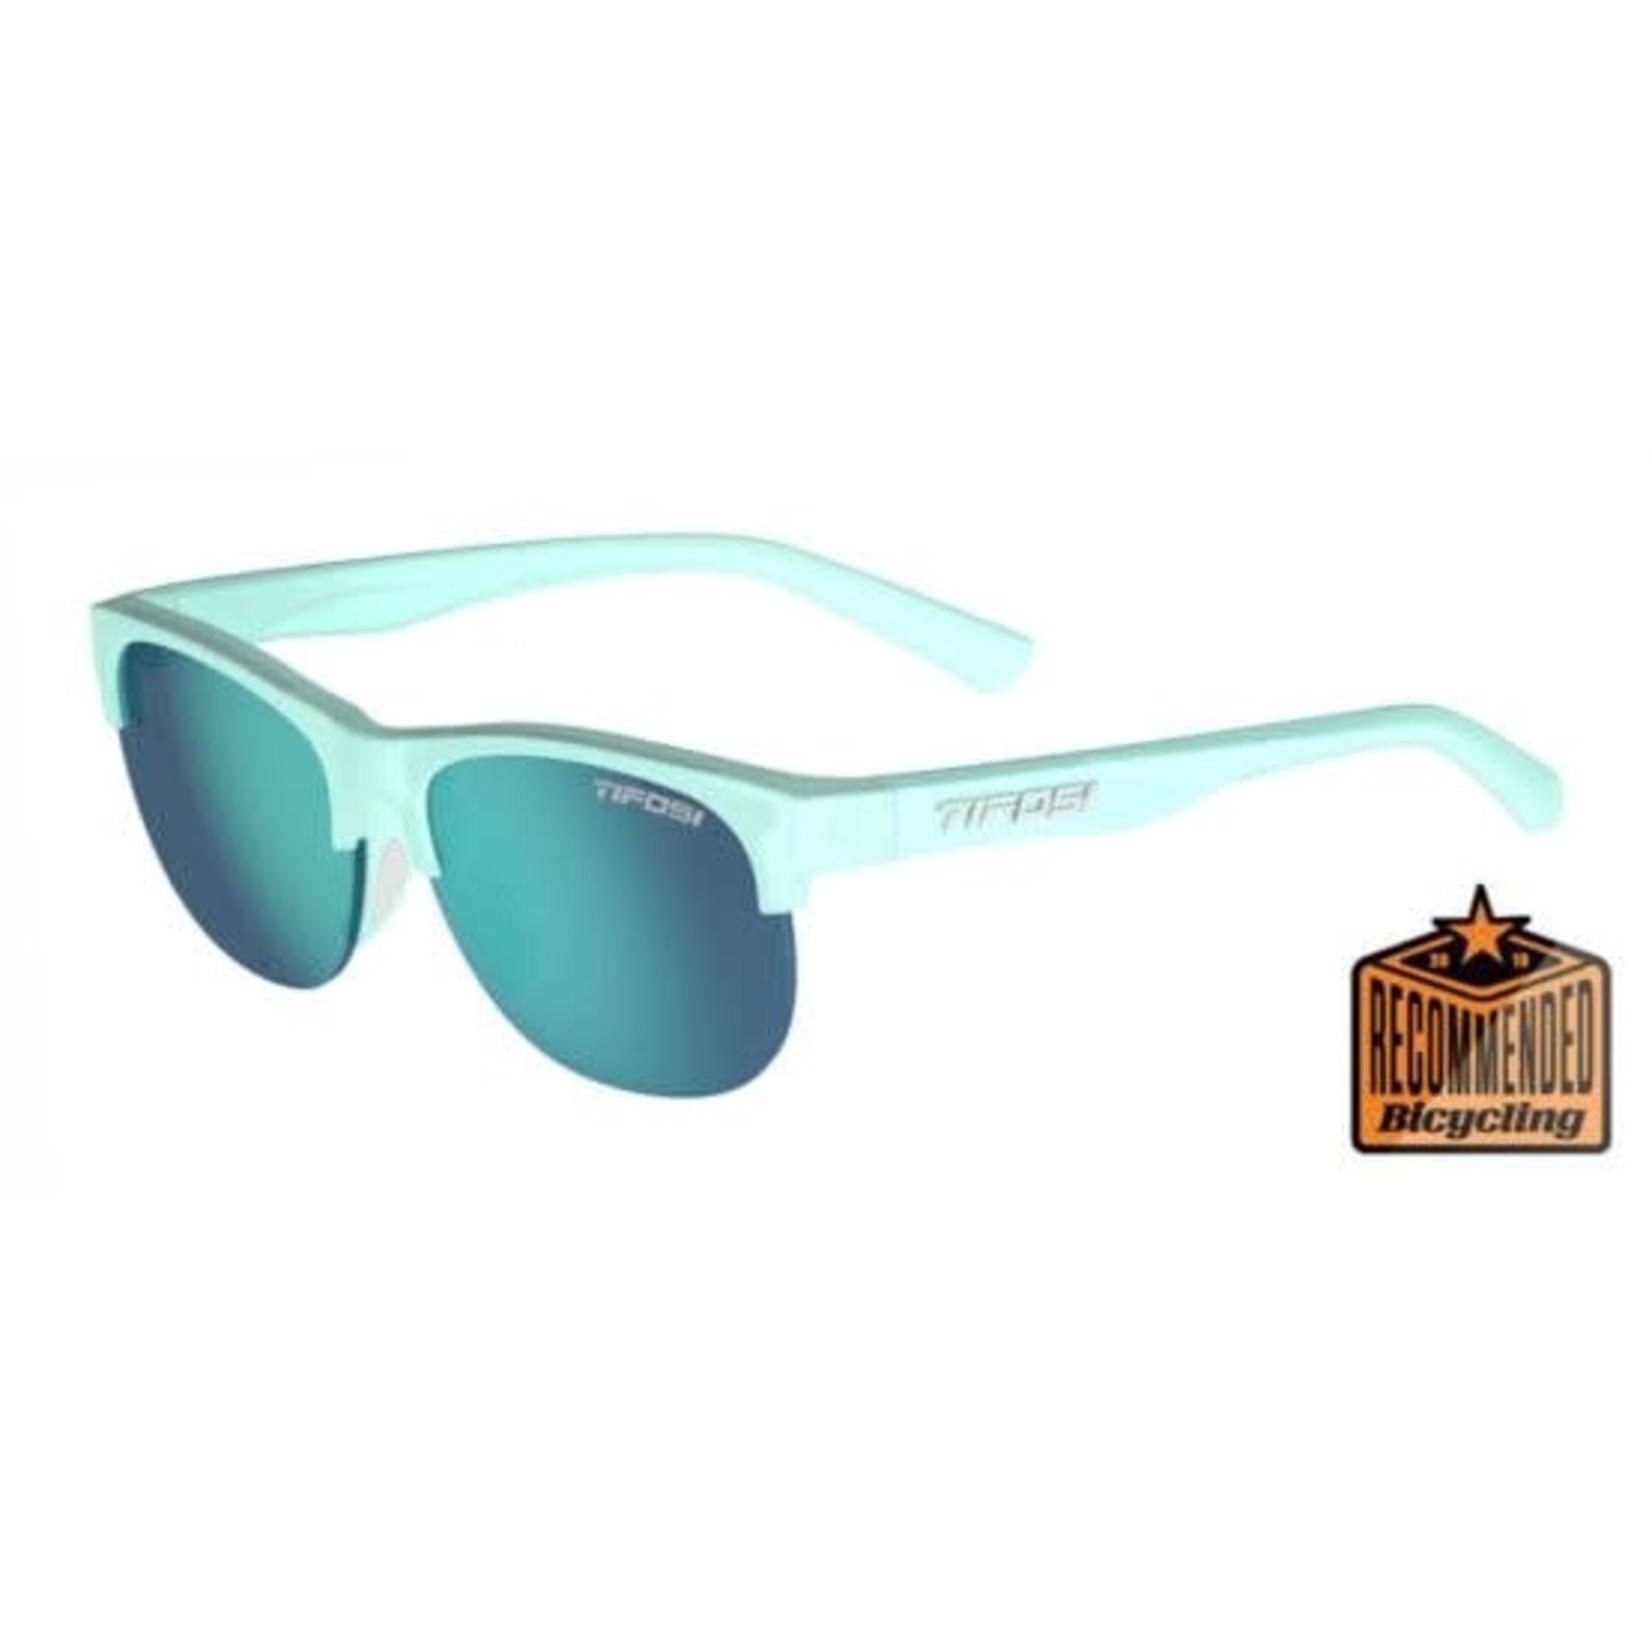 Tifosi Optics Swank SL, Satin Crystal Teal Single Lens Sunglasses